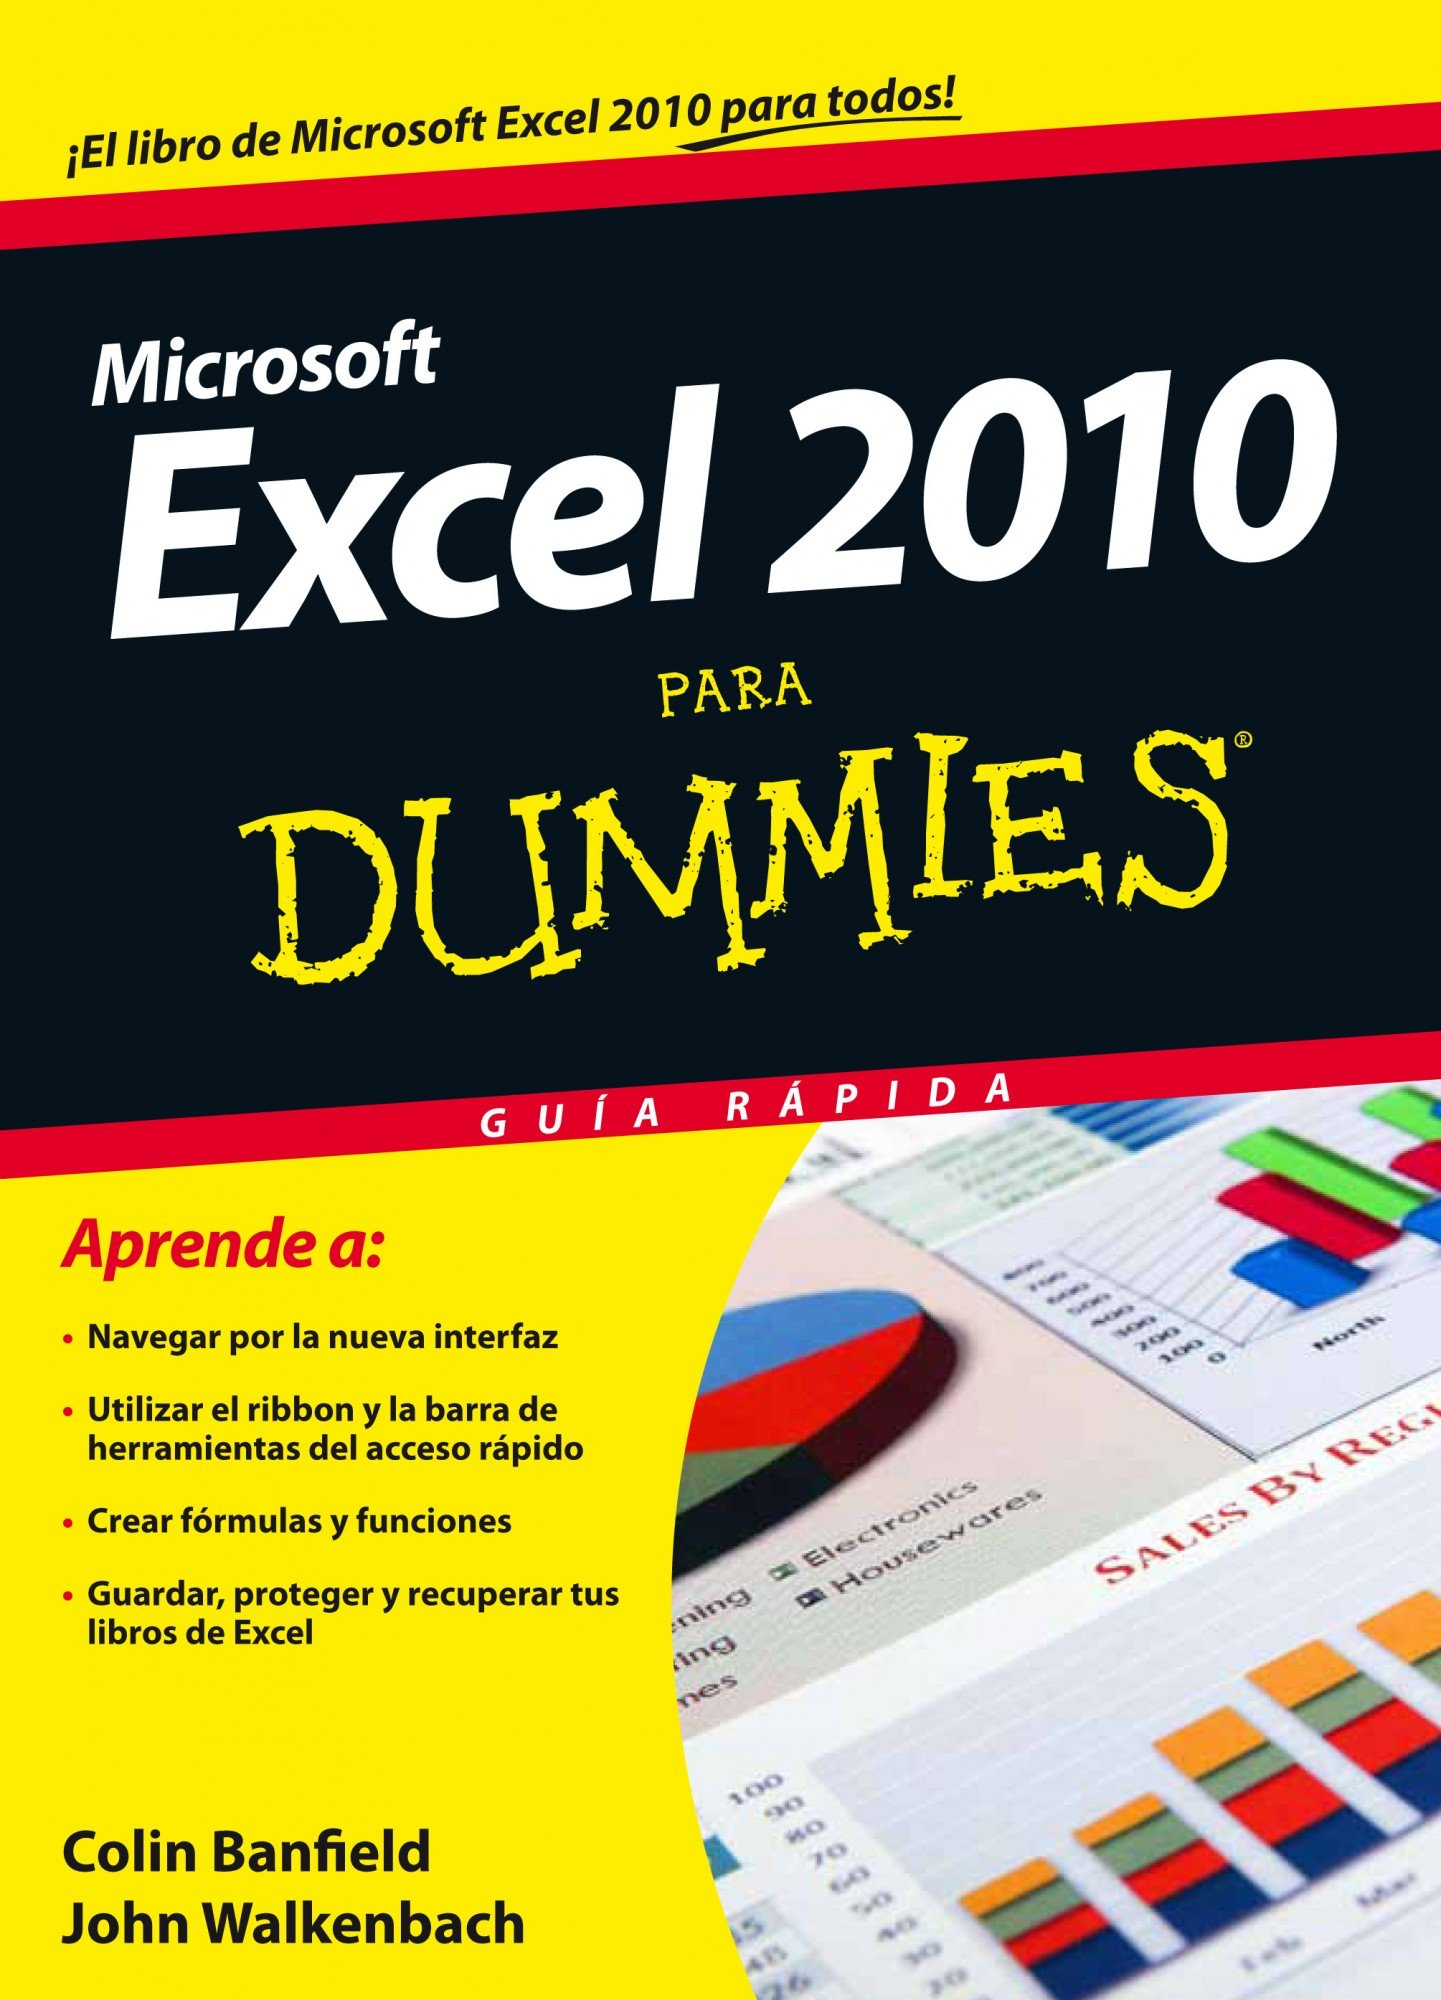 Excel 2010 para Dummies (Spanish) Paperback – January 1, 1900